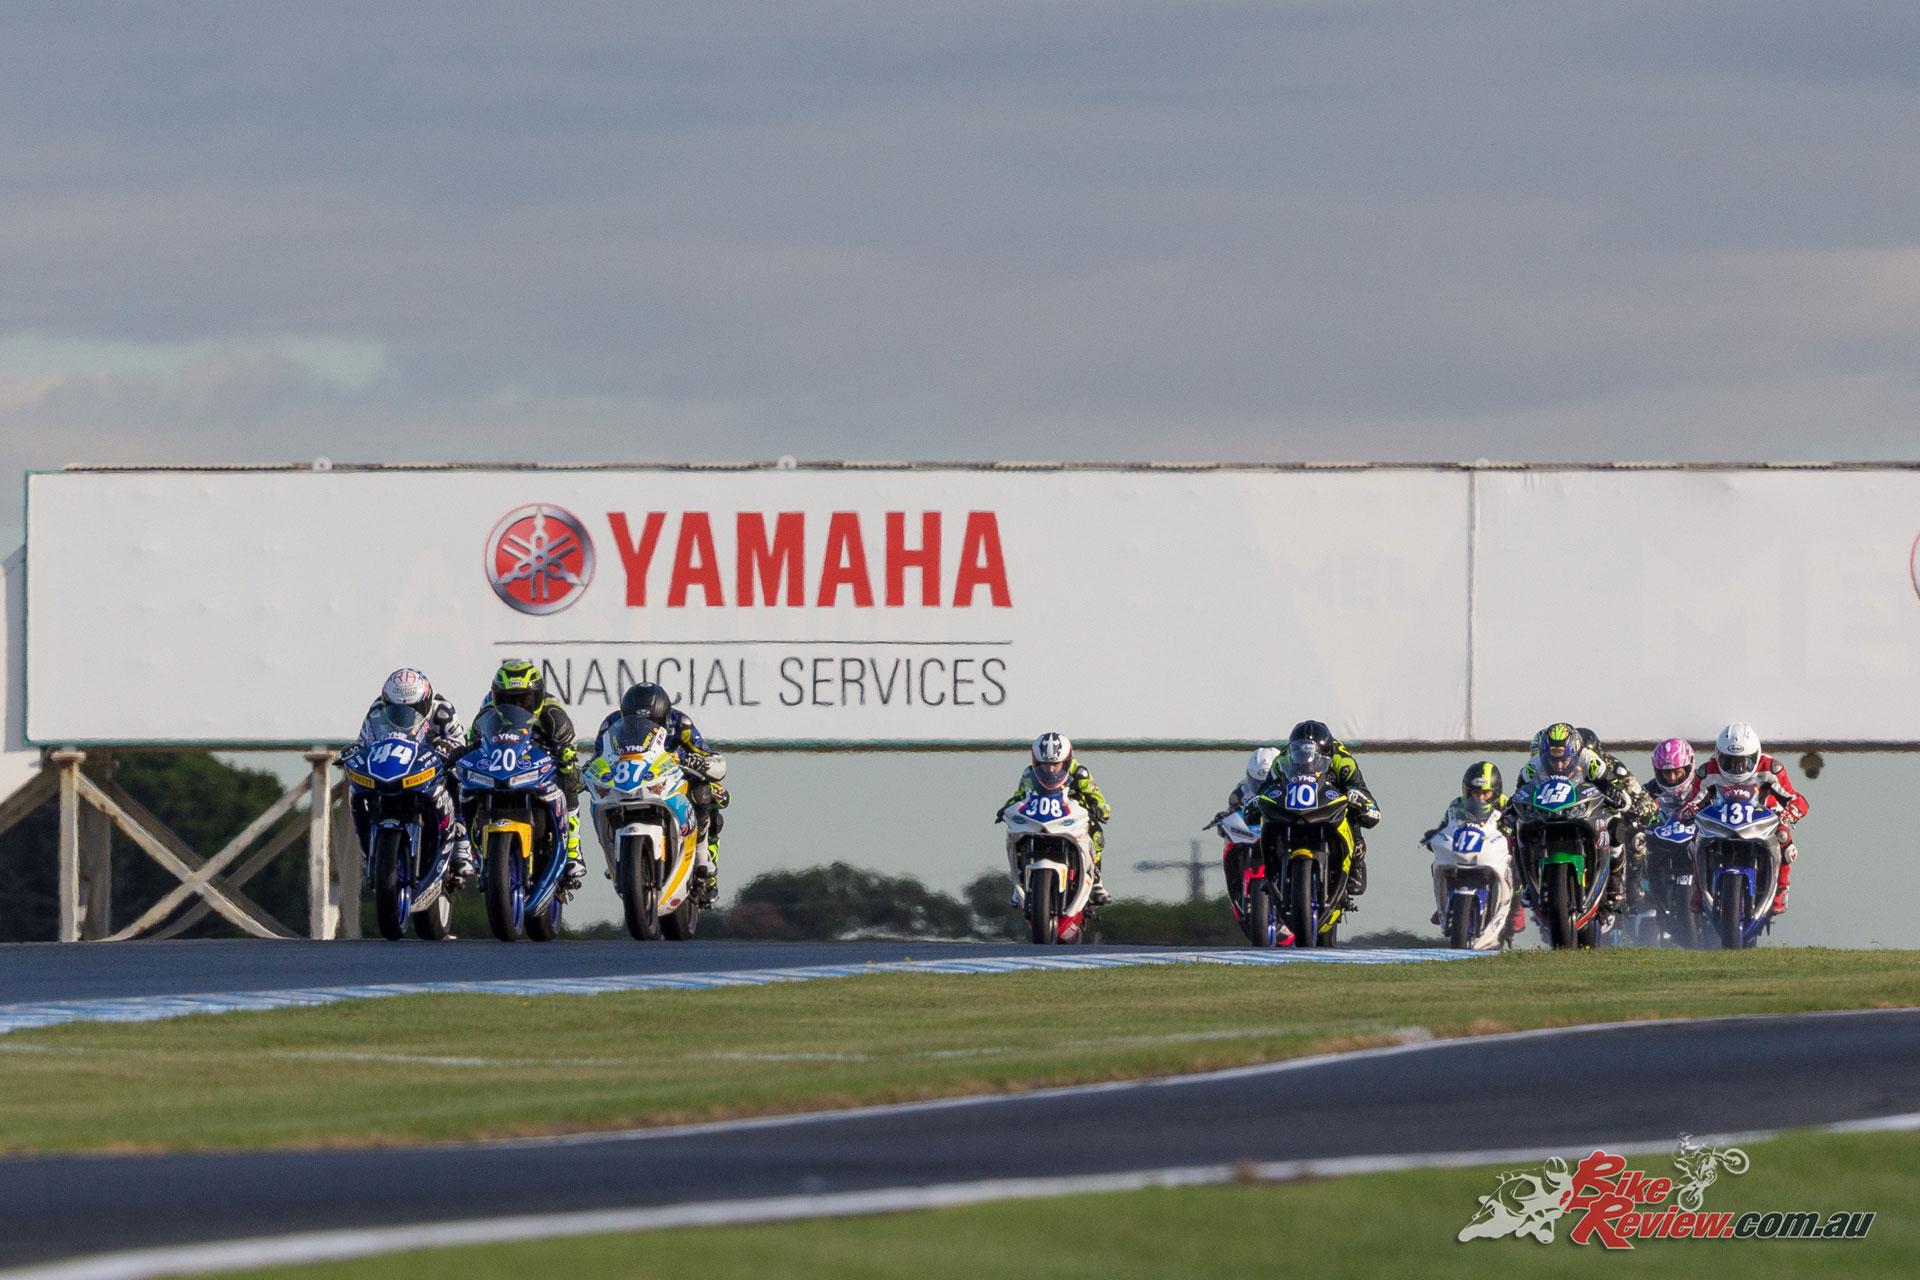 YMF R3 Cup - Image by TBG Sport